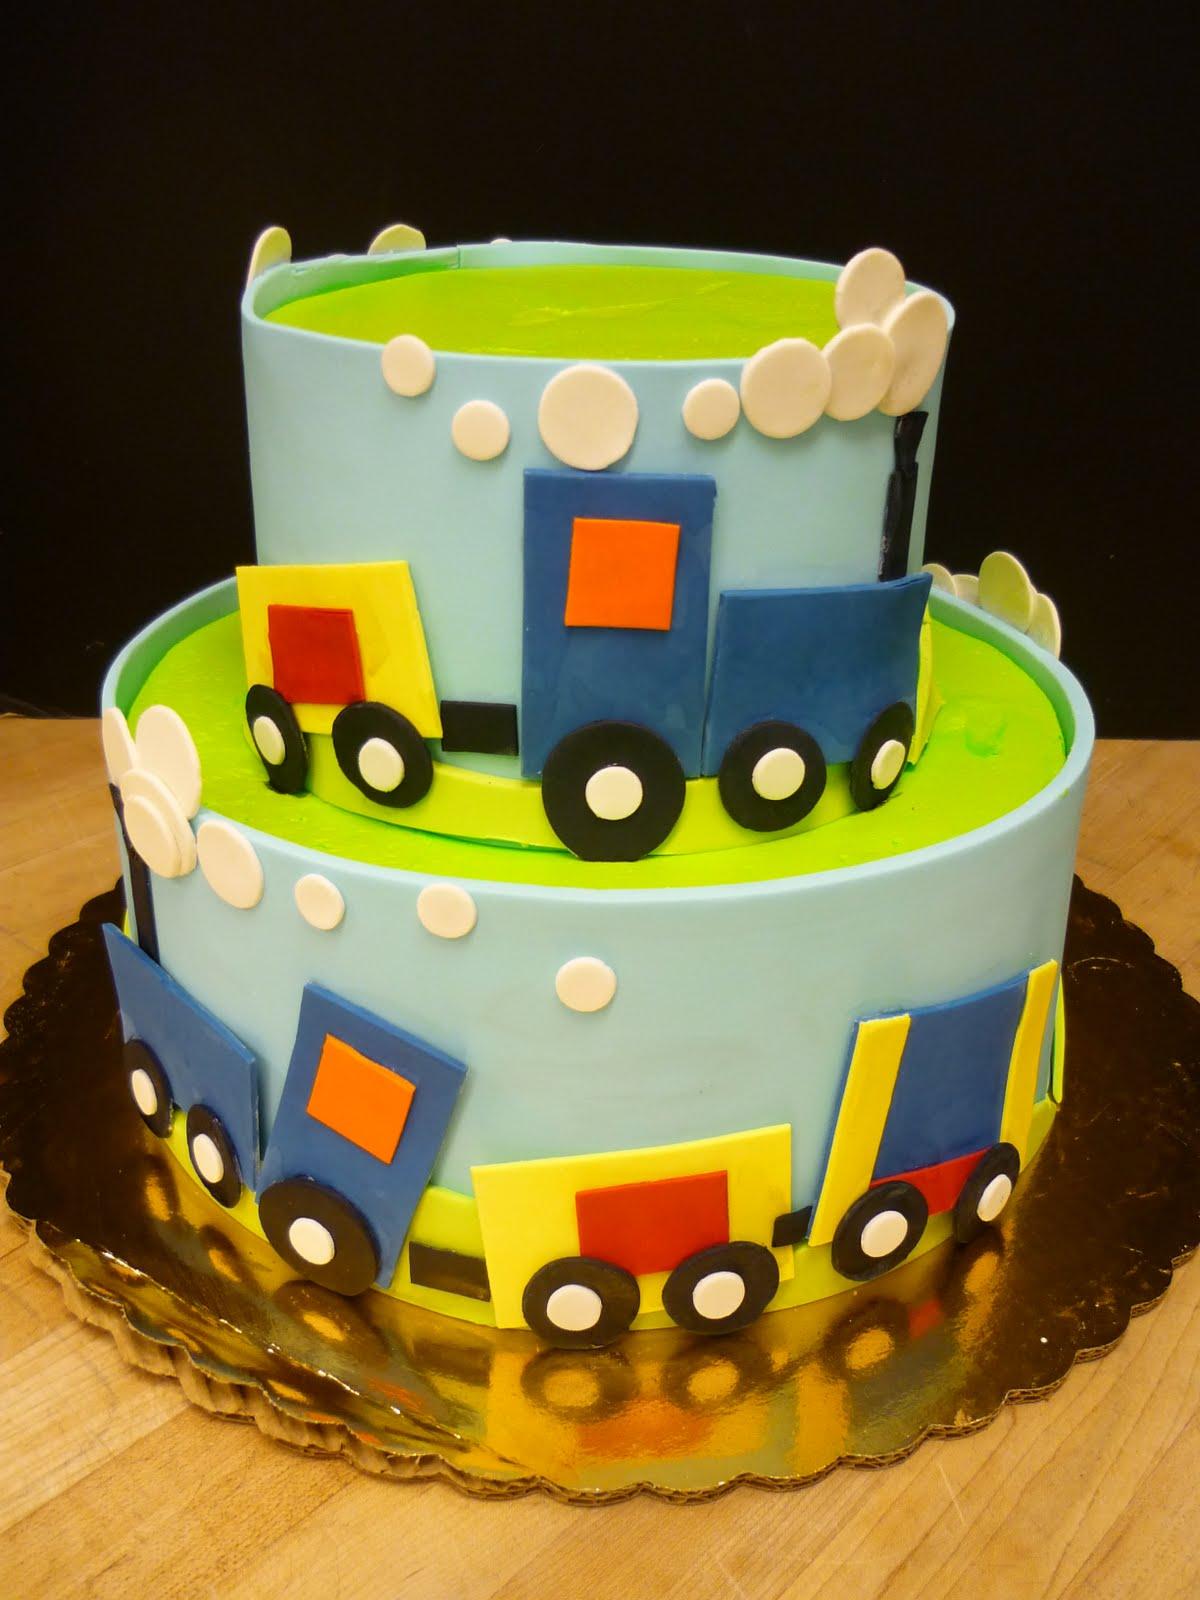 Kid Boy Birthday Cake Ideas Image Inspiration of Cake and